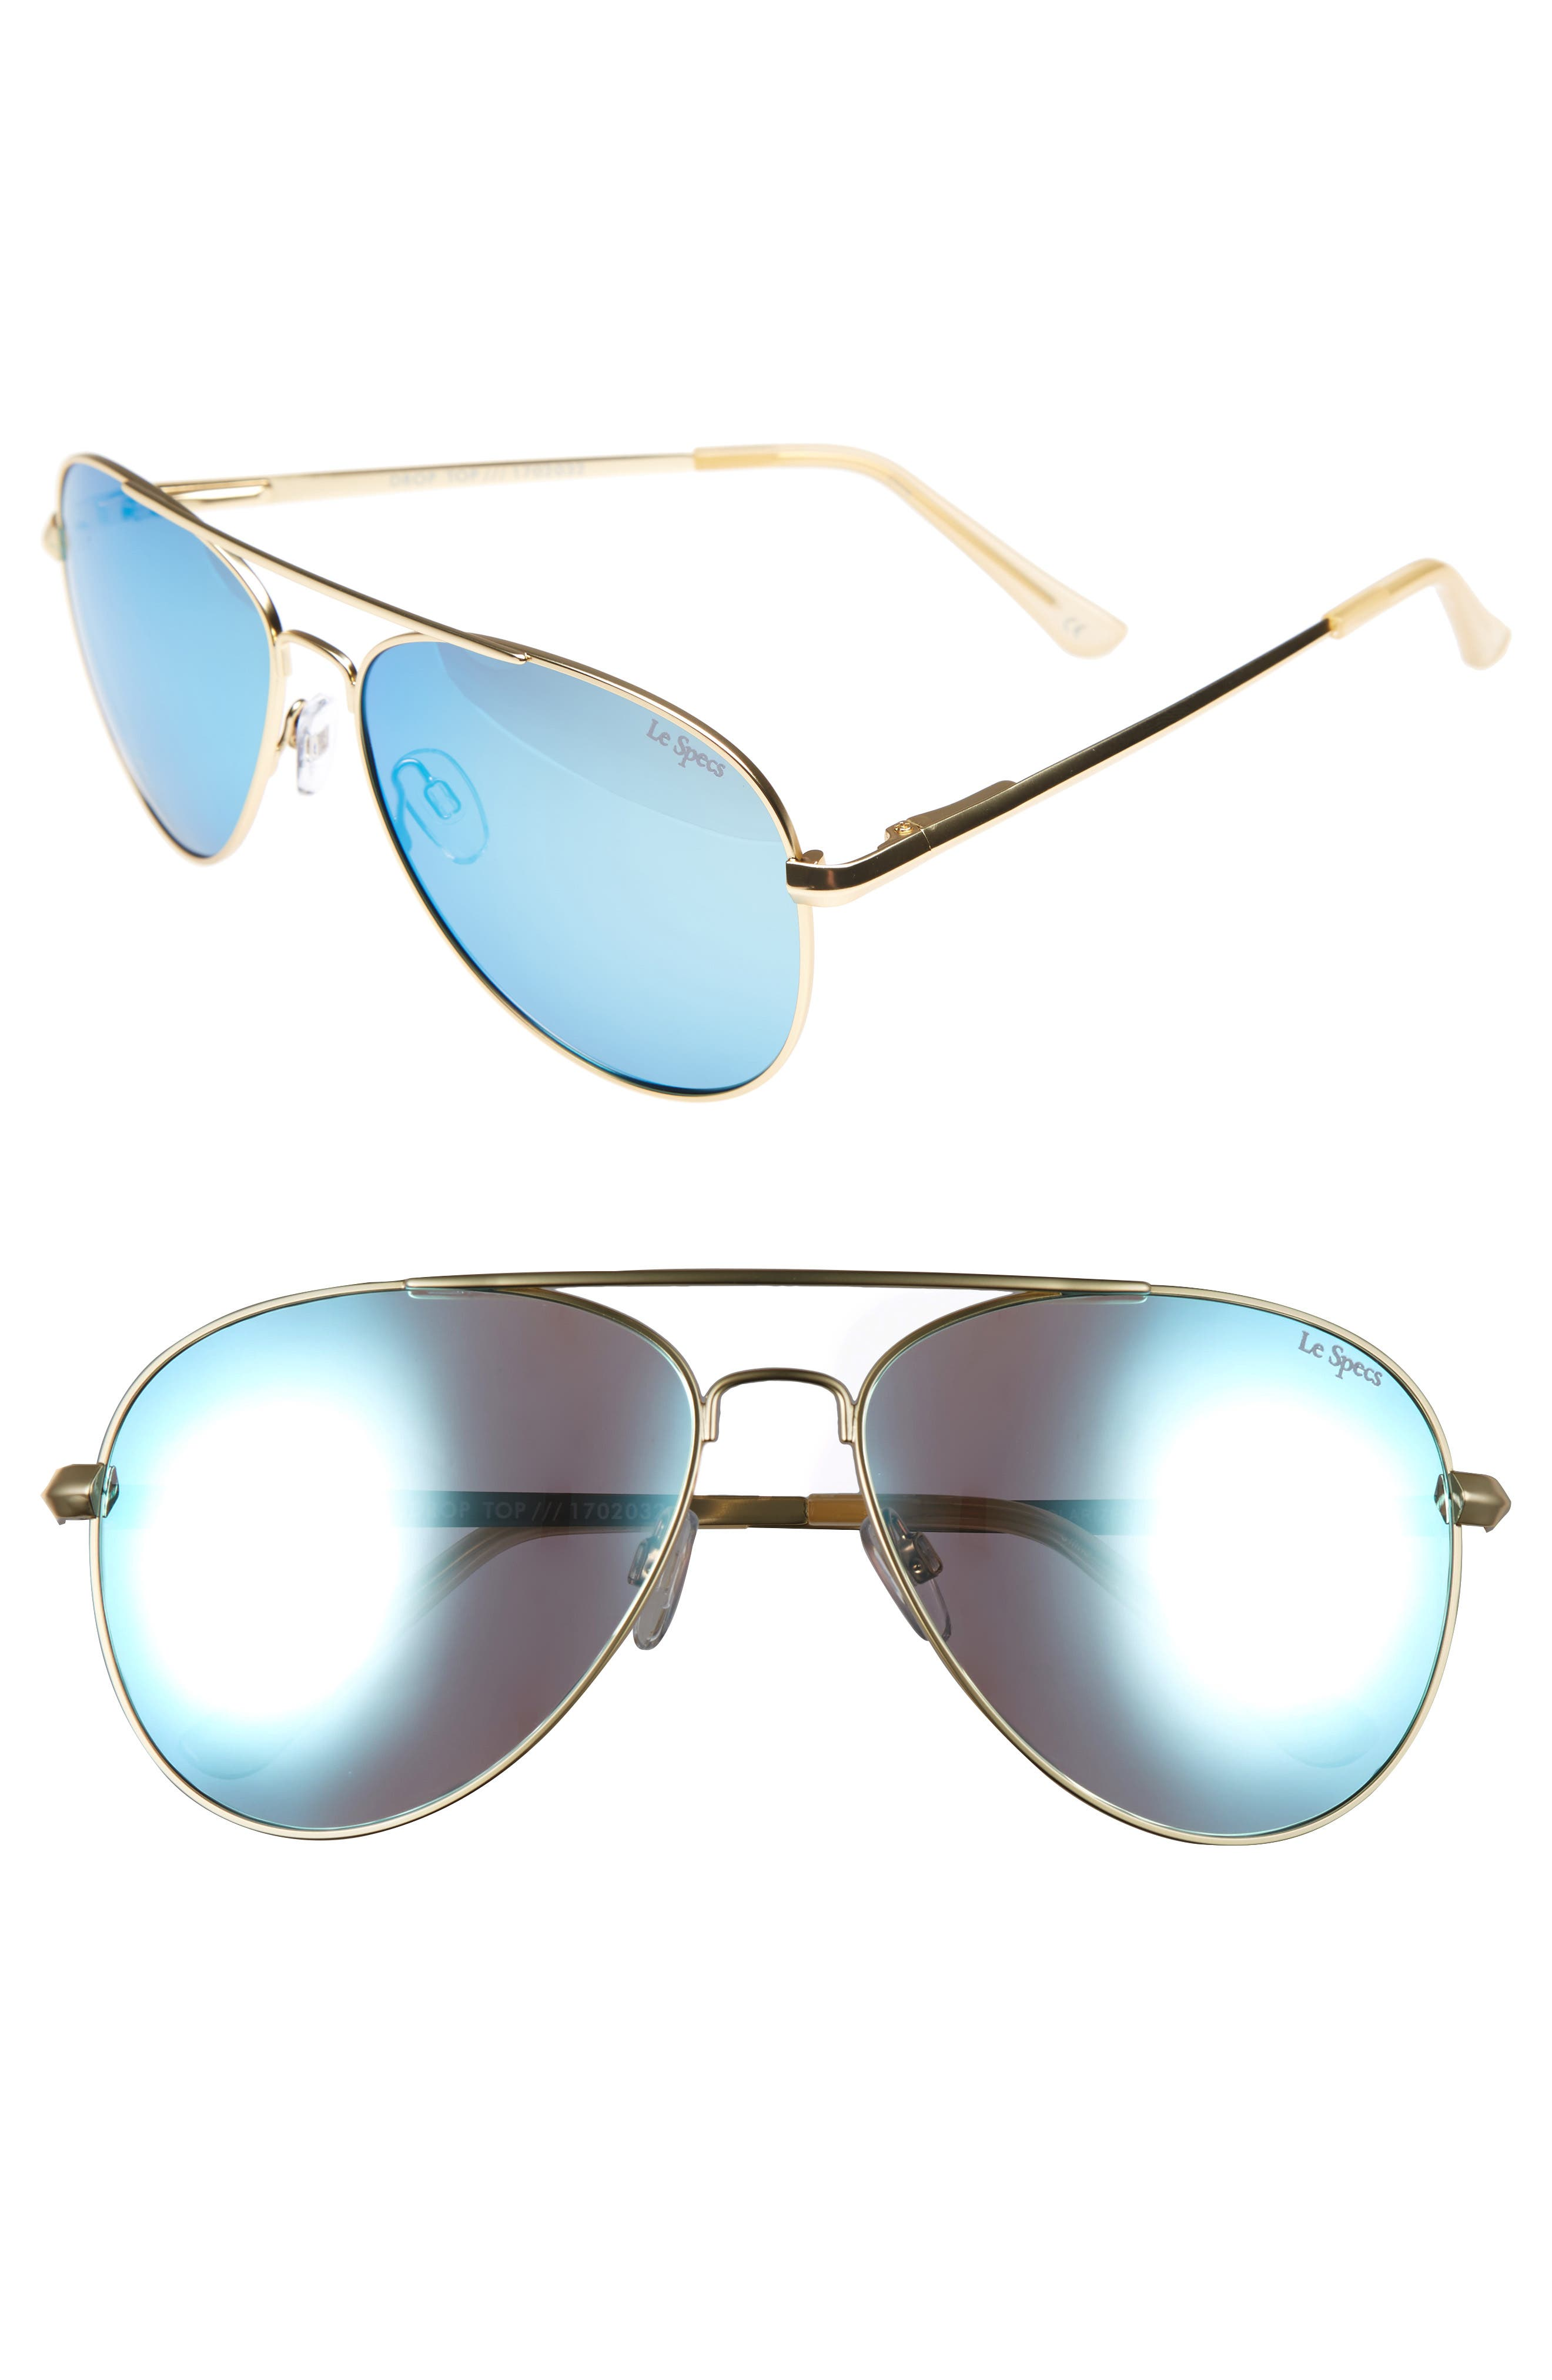 Drop Top 60mm Polarized Aviator Sunglasses,                             Main thumbnail 1, color,                             710